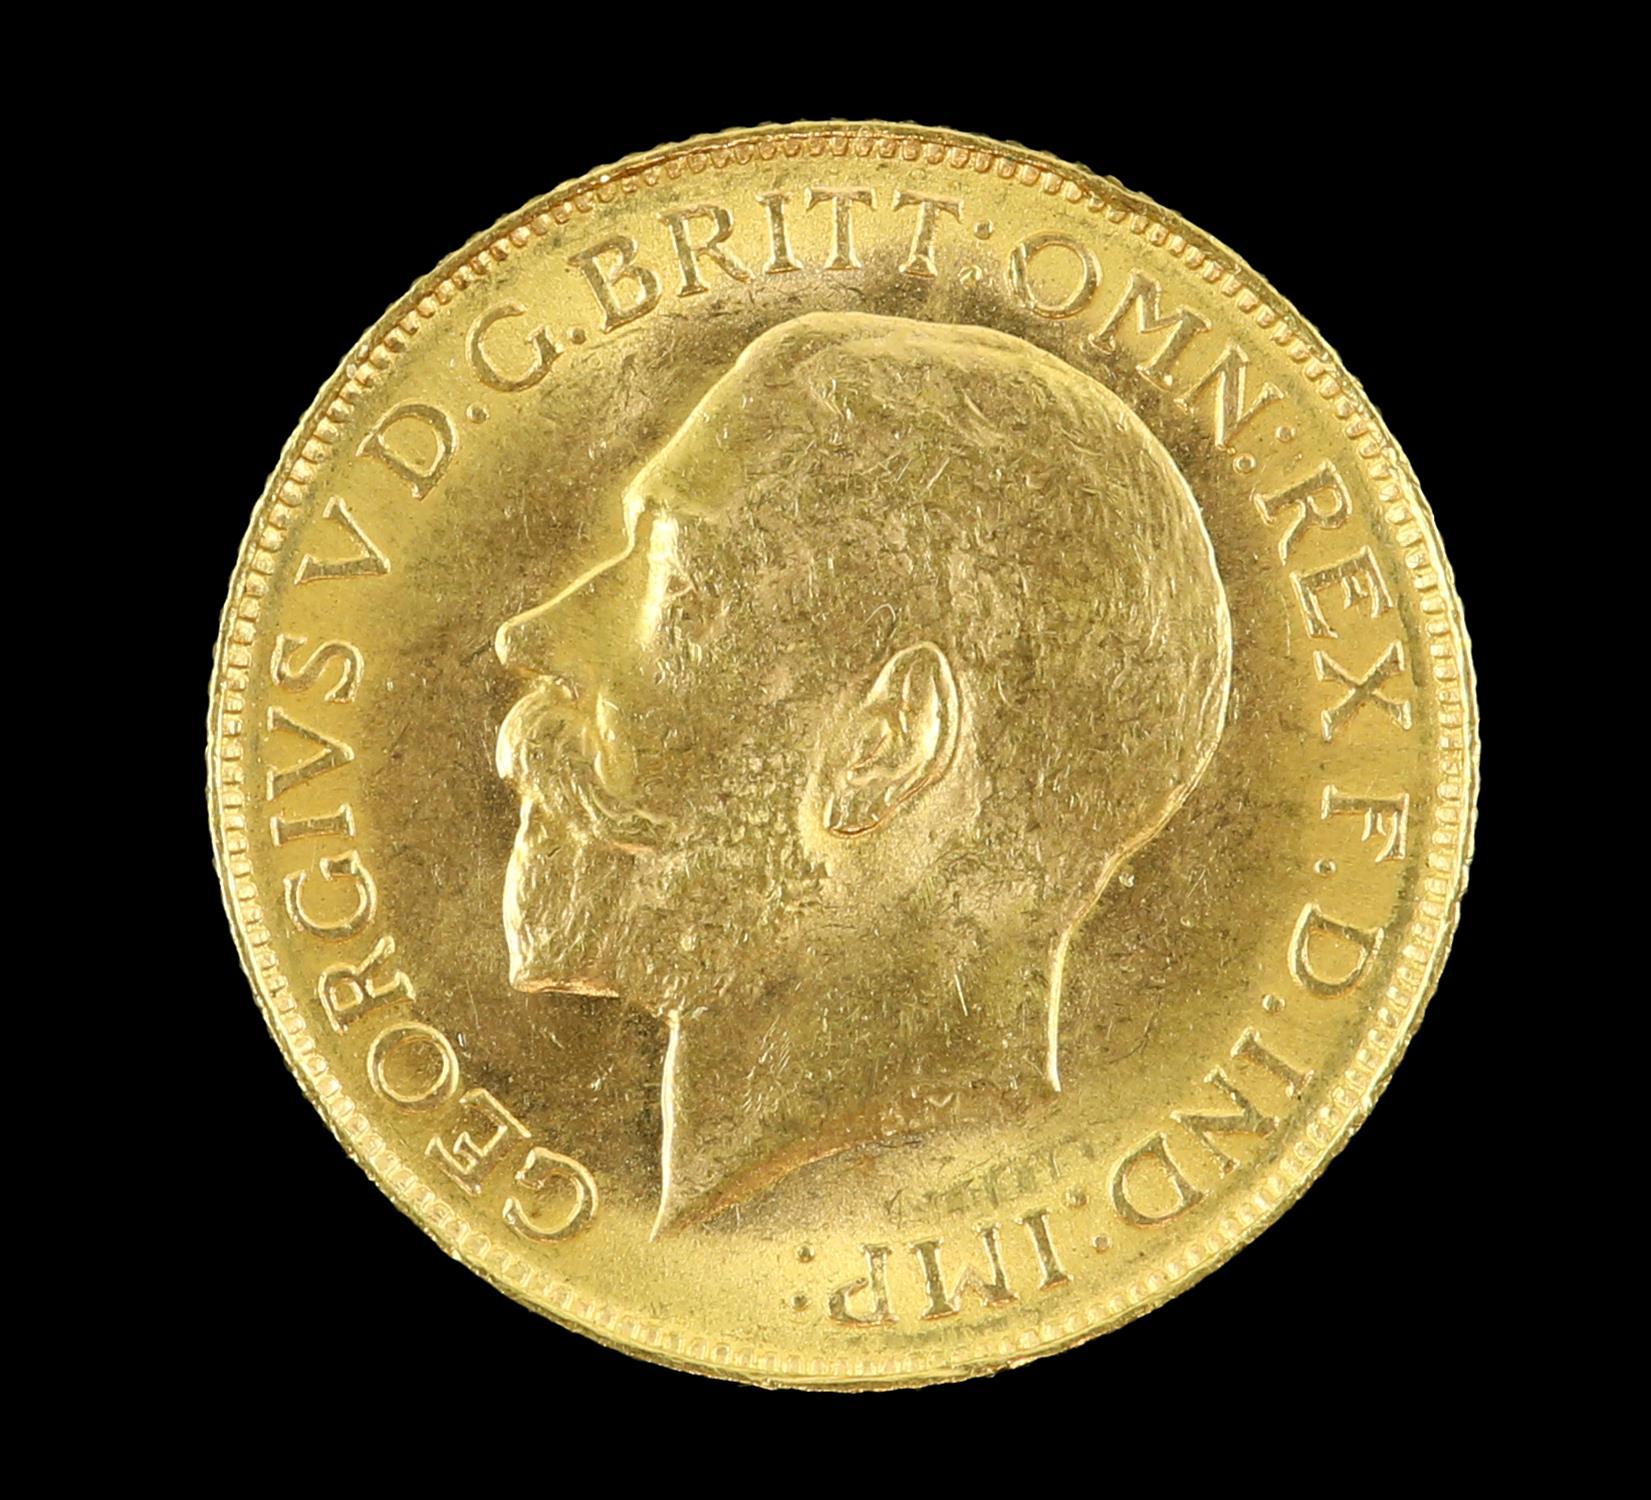 George V gold sovereign 1911 - Image 2 of 2